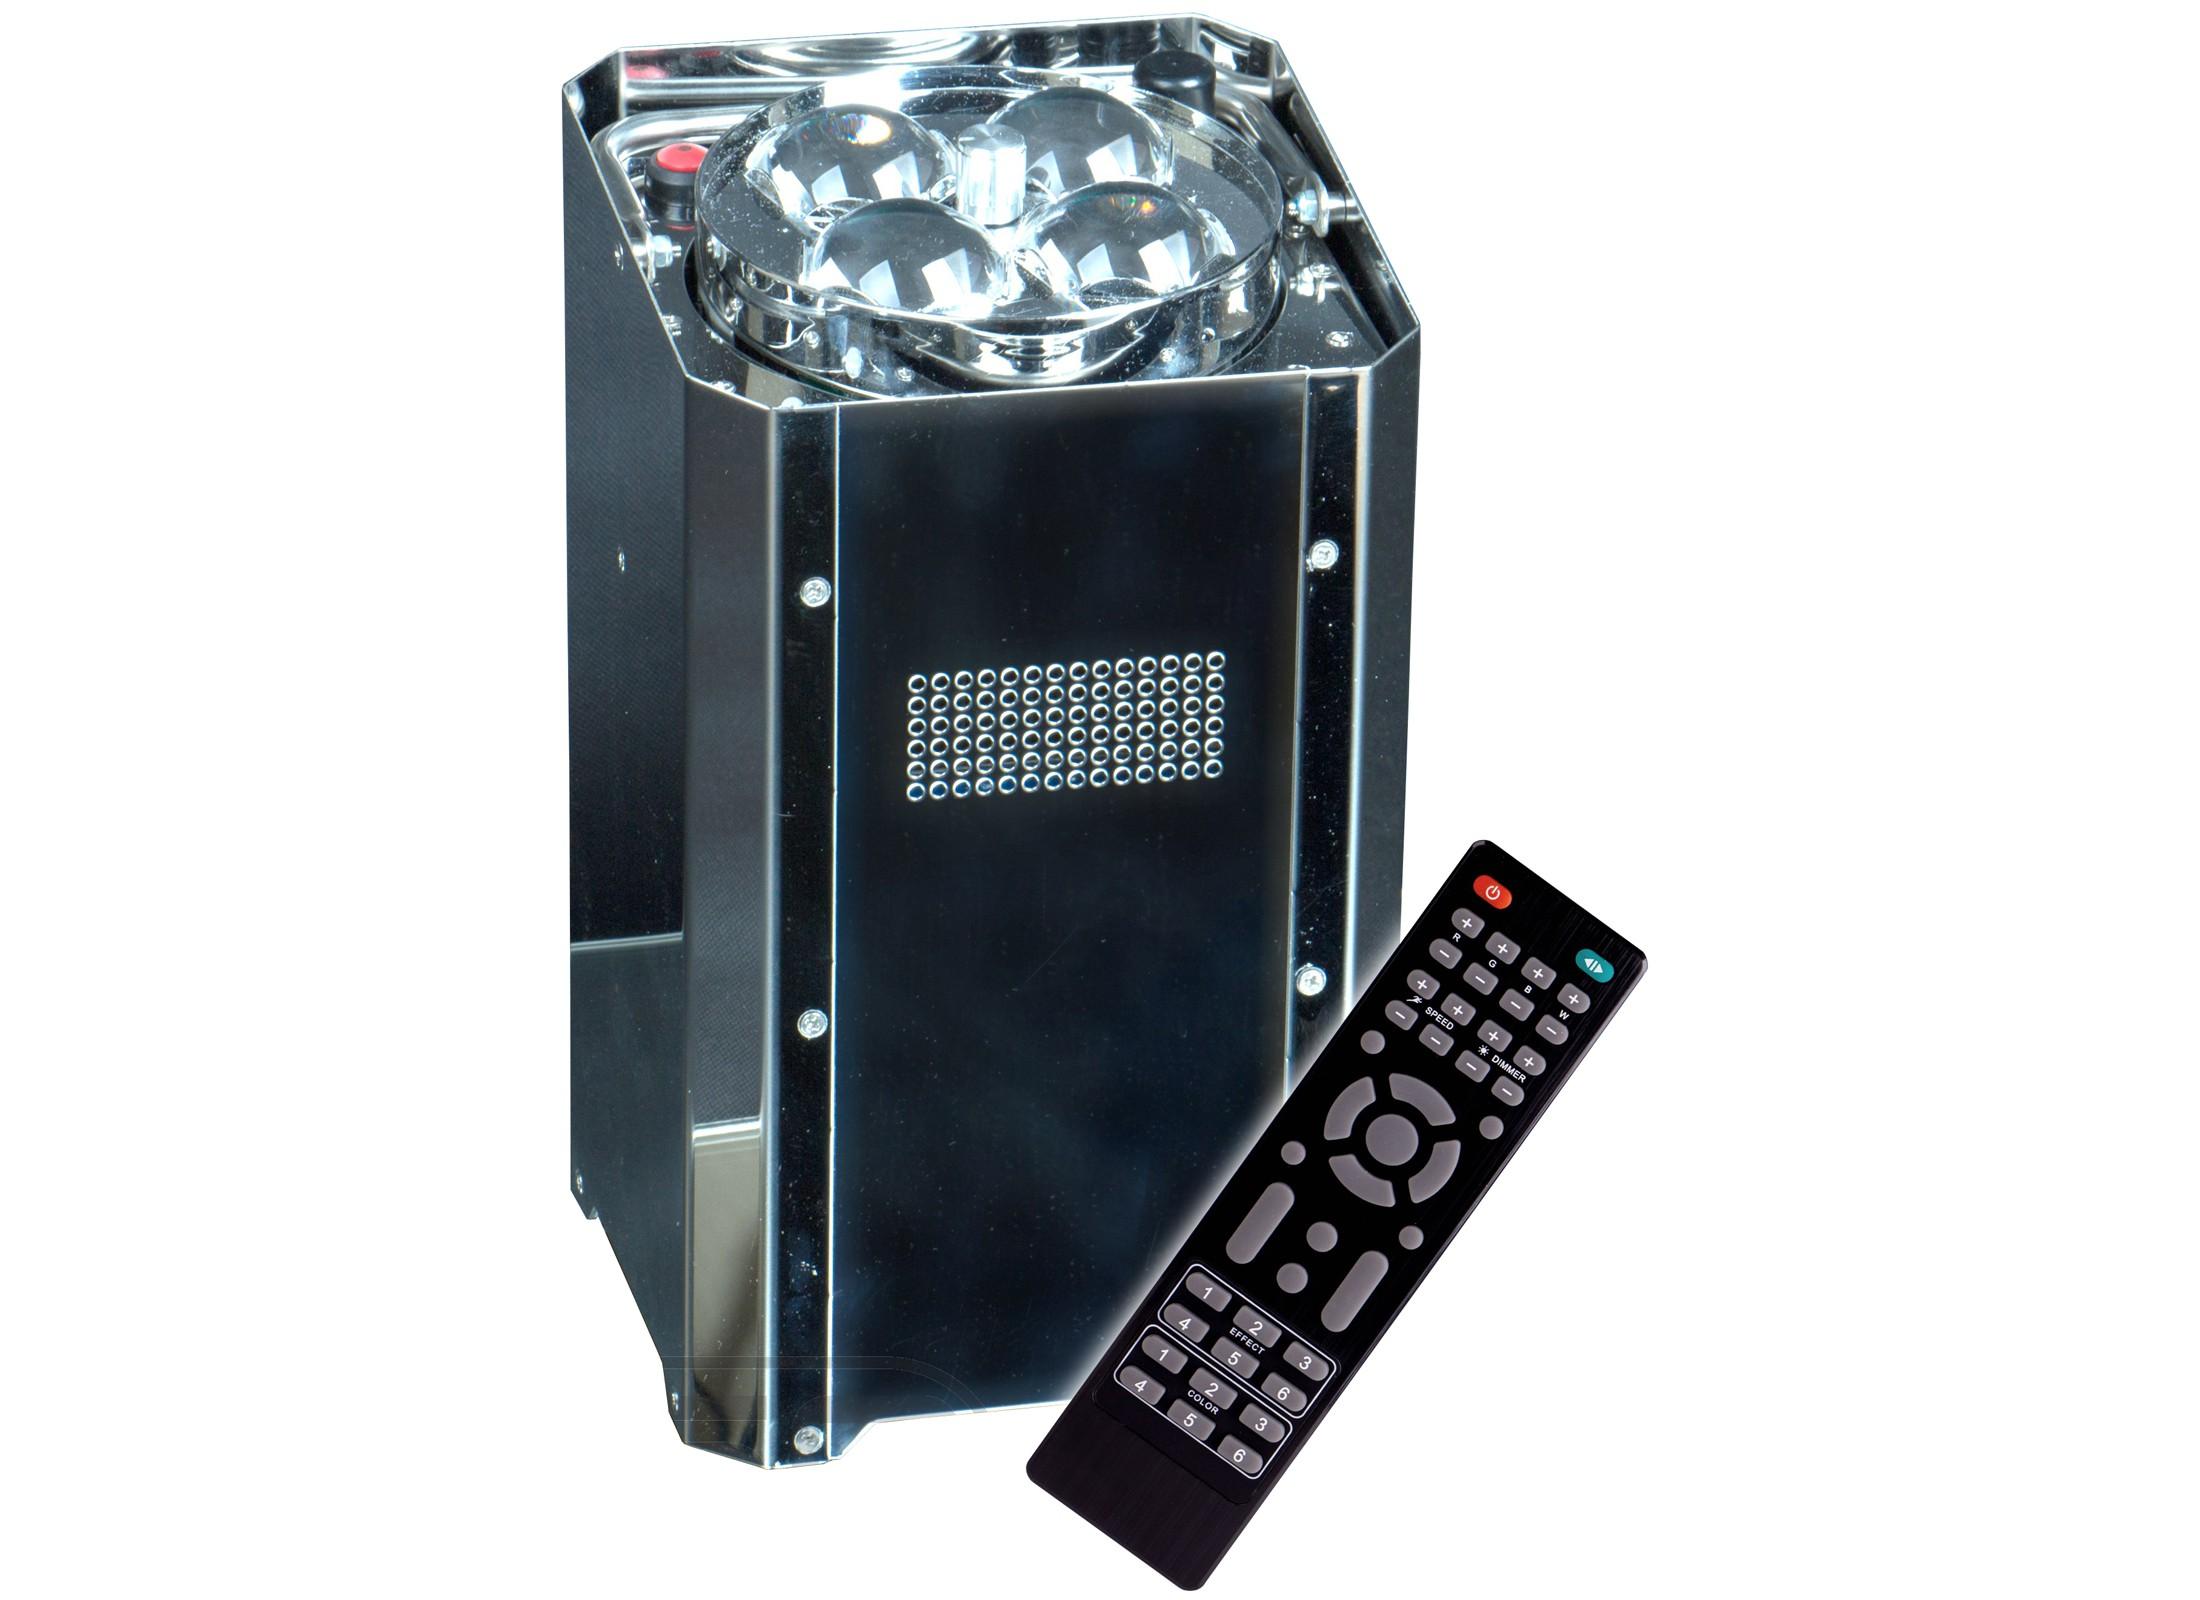 briteq bt akkuzoom 6er set led akku scheinwerfer bei huss. Black Bedroom Furniture Sets. Home Design Ideas